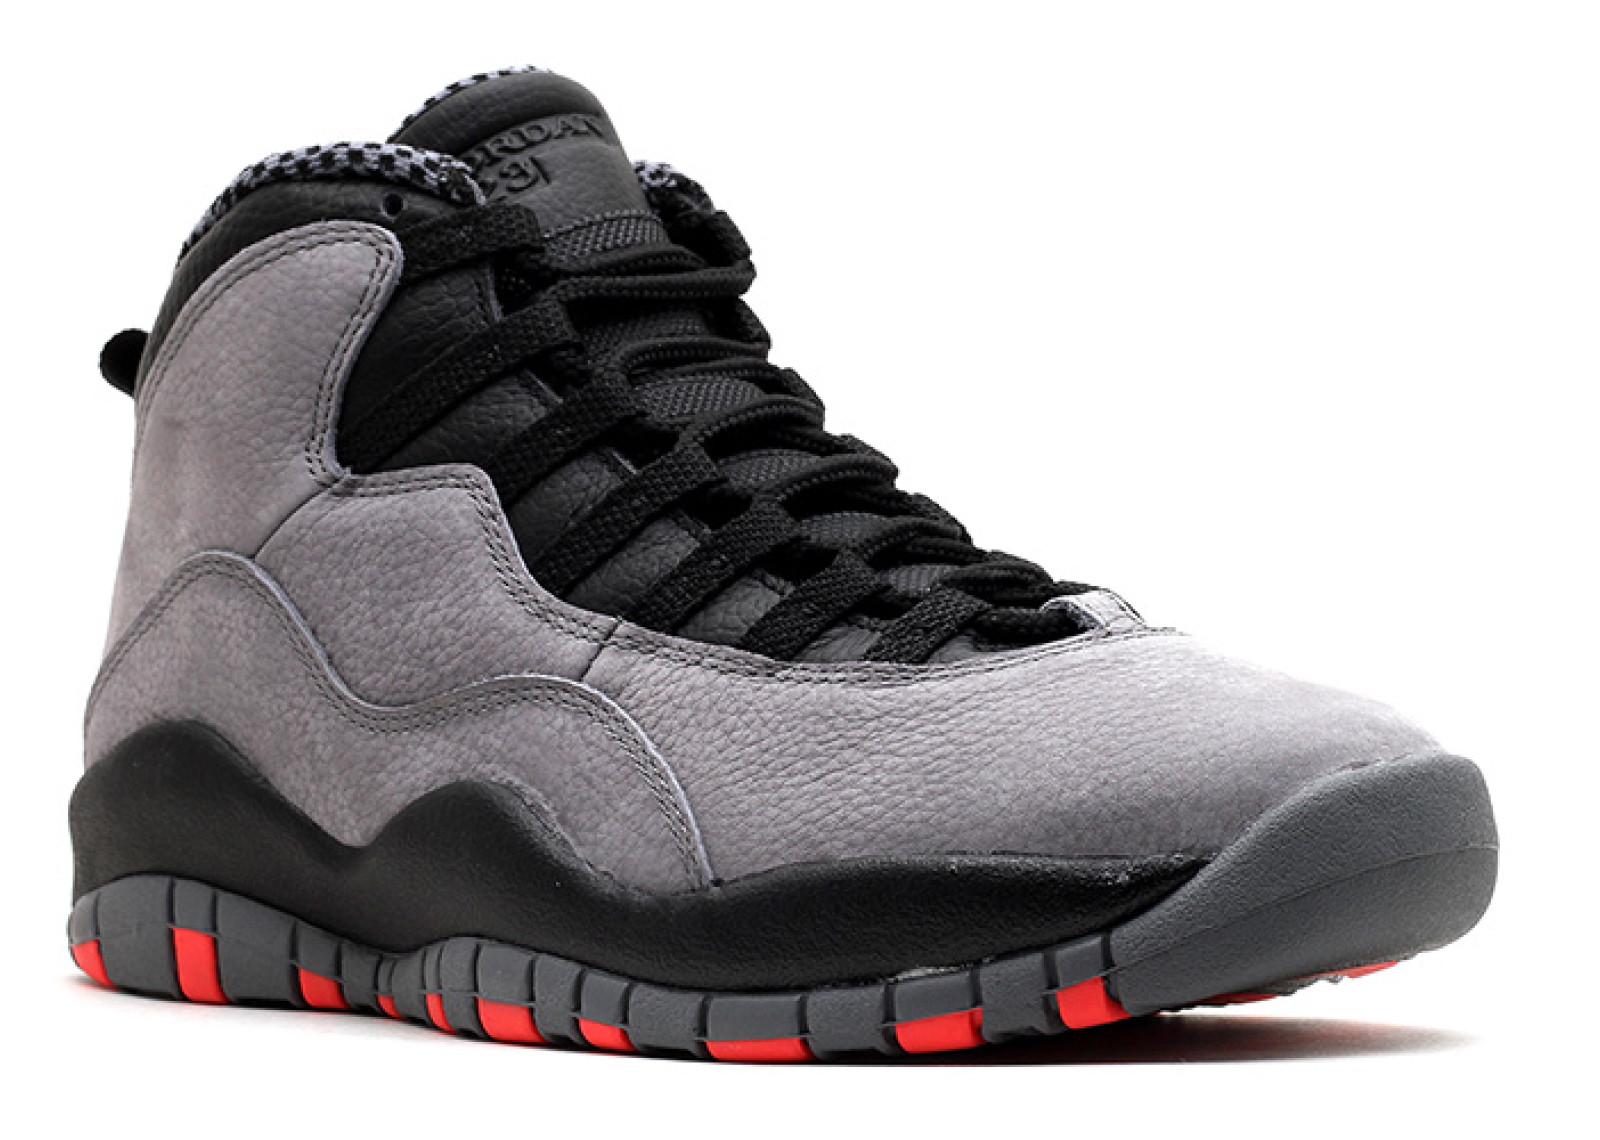 0891601cf5fd Air Jordan - Men - Air Jordan Retro 10  Cool Grey  - 310805-023 - Size 8